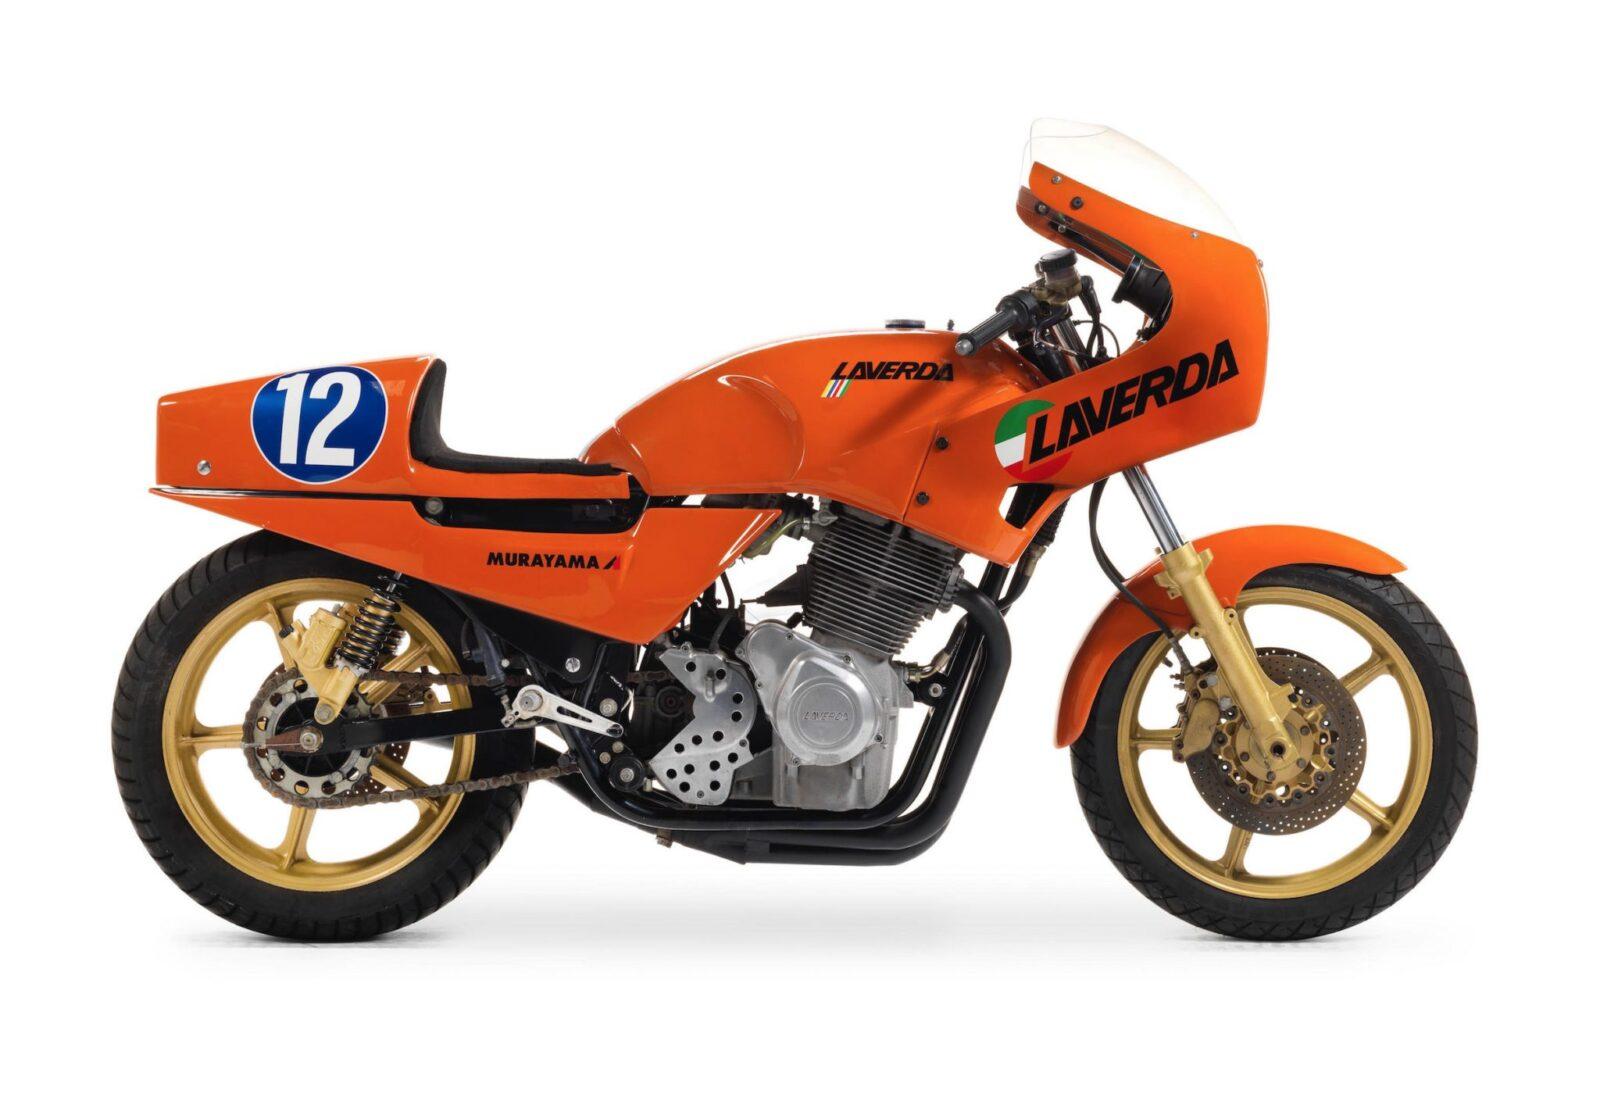 Laverda TT1 RGS Hero Image 1600x1098 - Semi-Works Racer: 1983 Laverda TT1 RGS Corsa